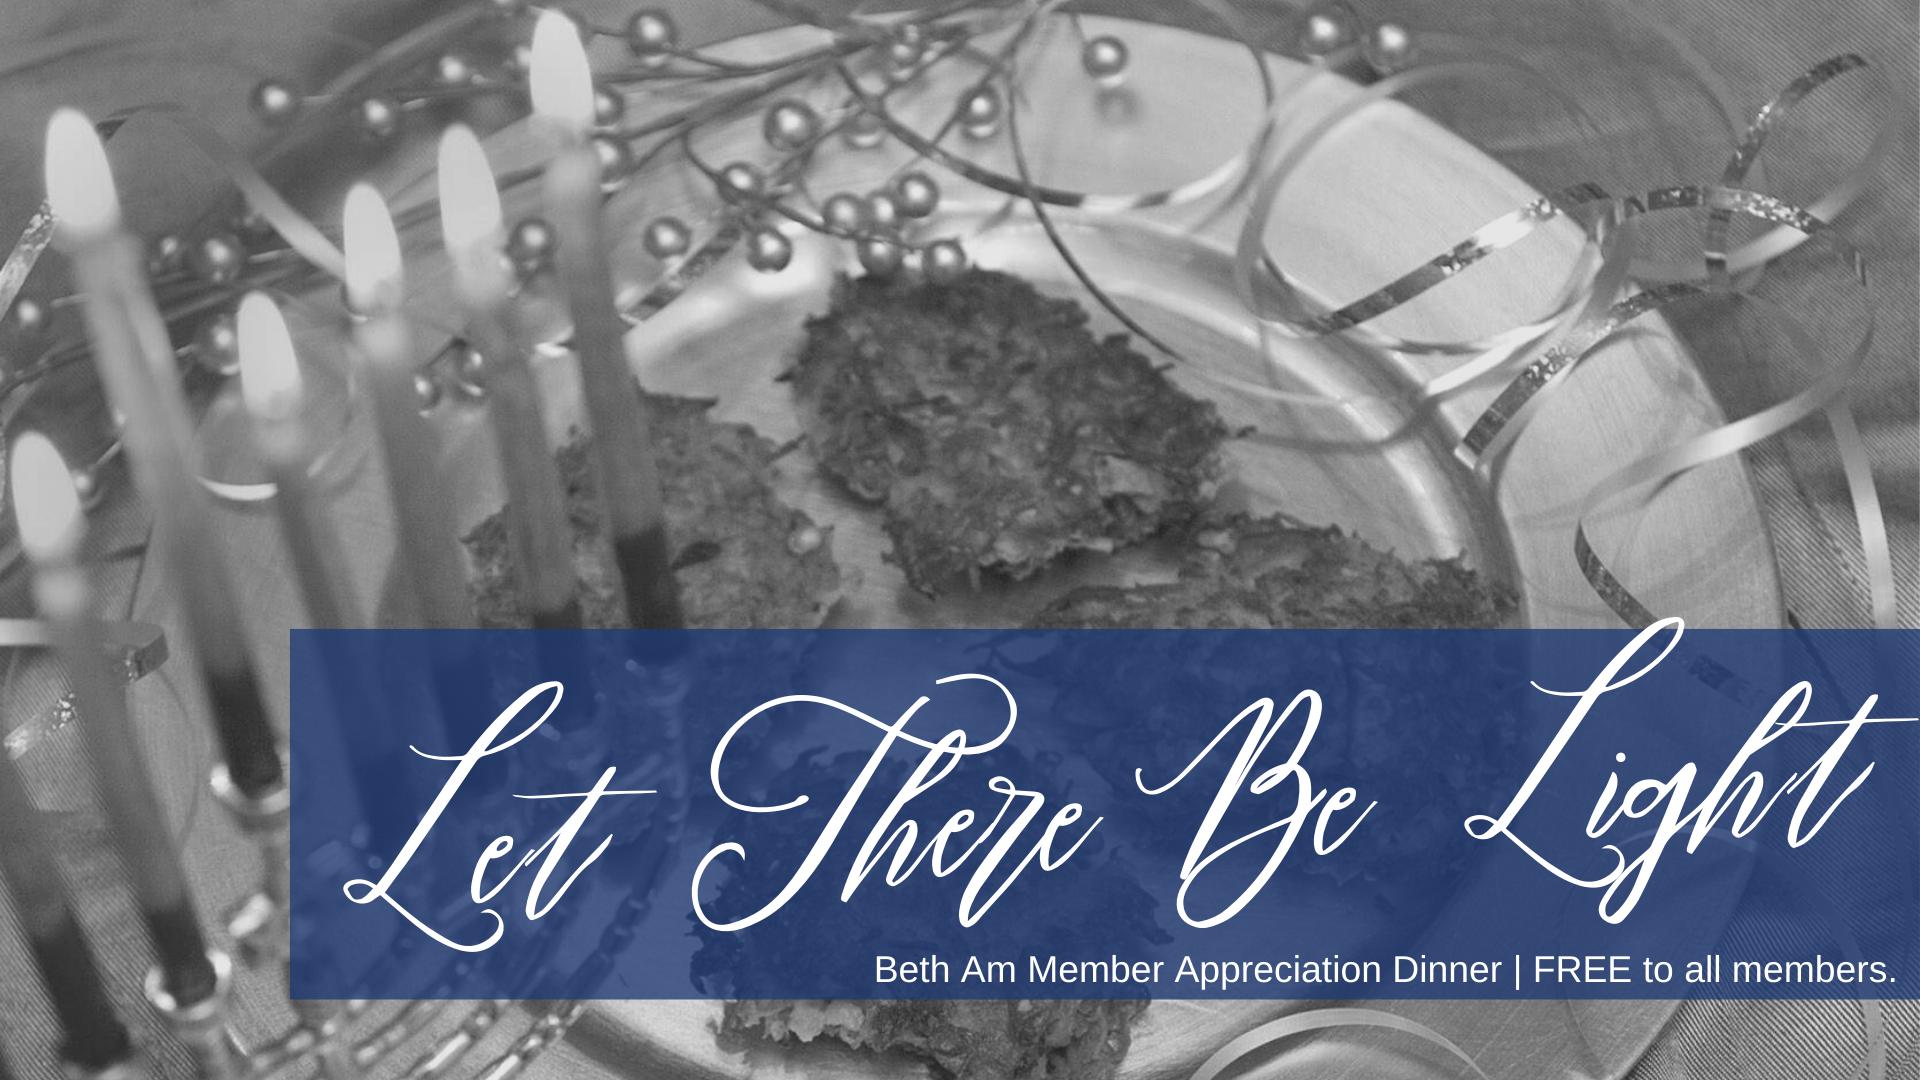 Banner Image for Let There Be Light (Pre-Hanukkah Dinner)